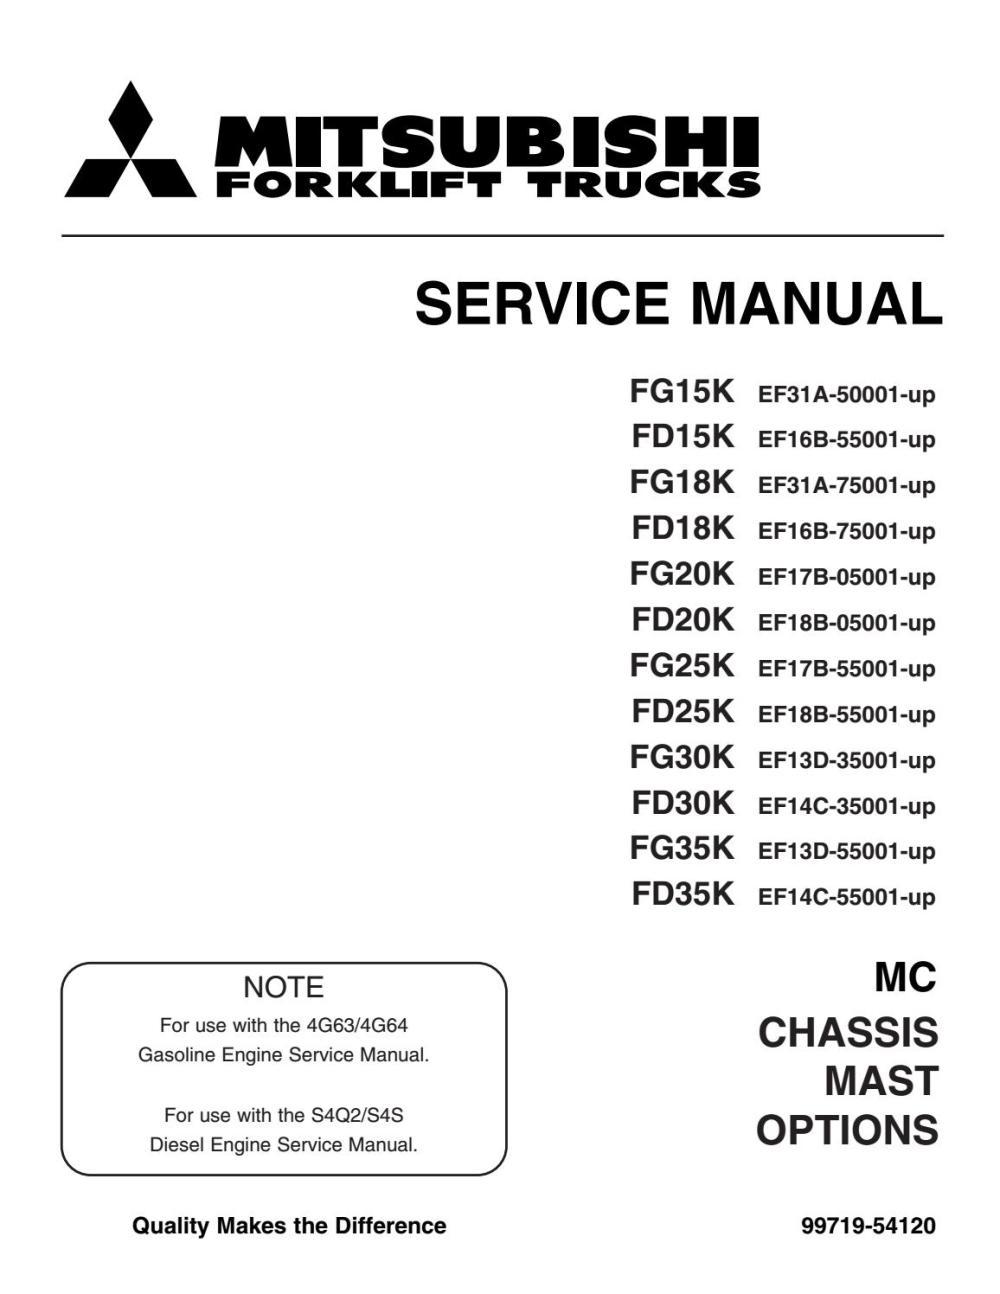 medium resolution of mitsubishi fg35k mc forklift trucks service repair manual sn ef14c 55001 up by 16326108 issuu